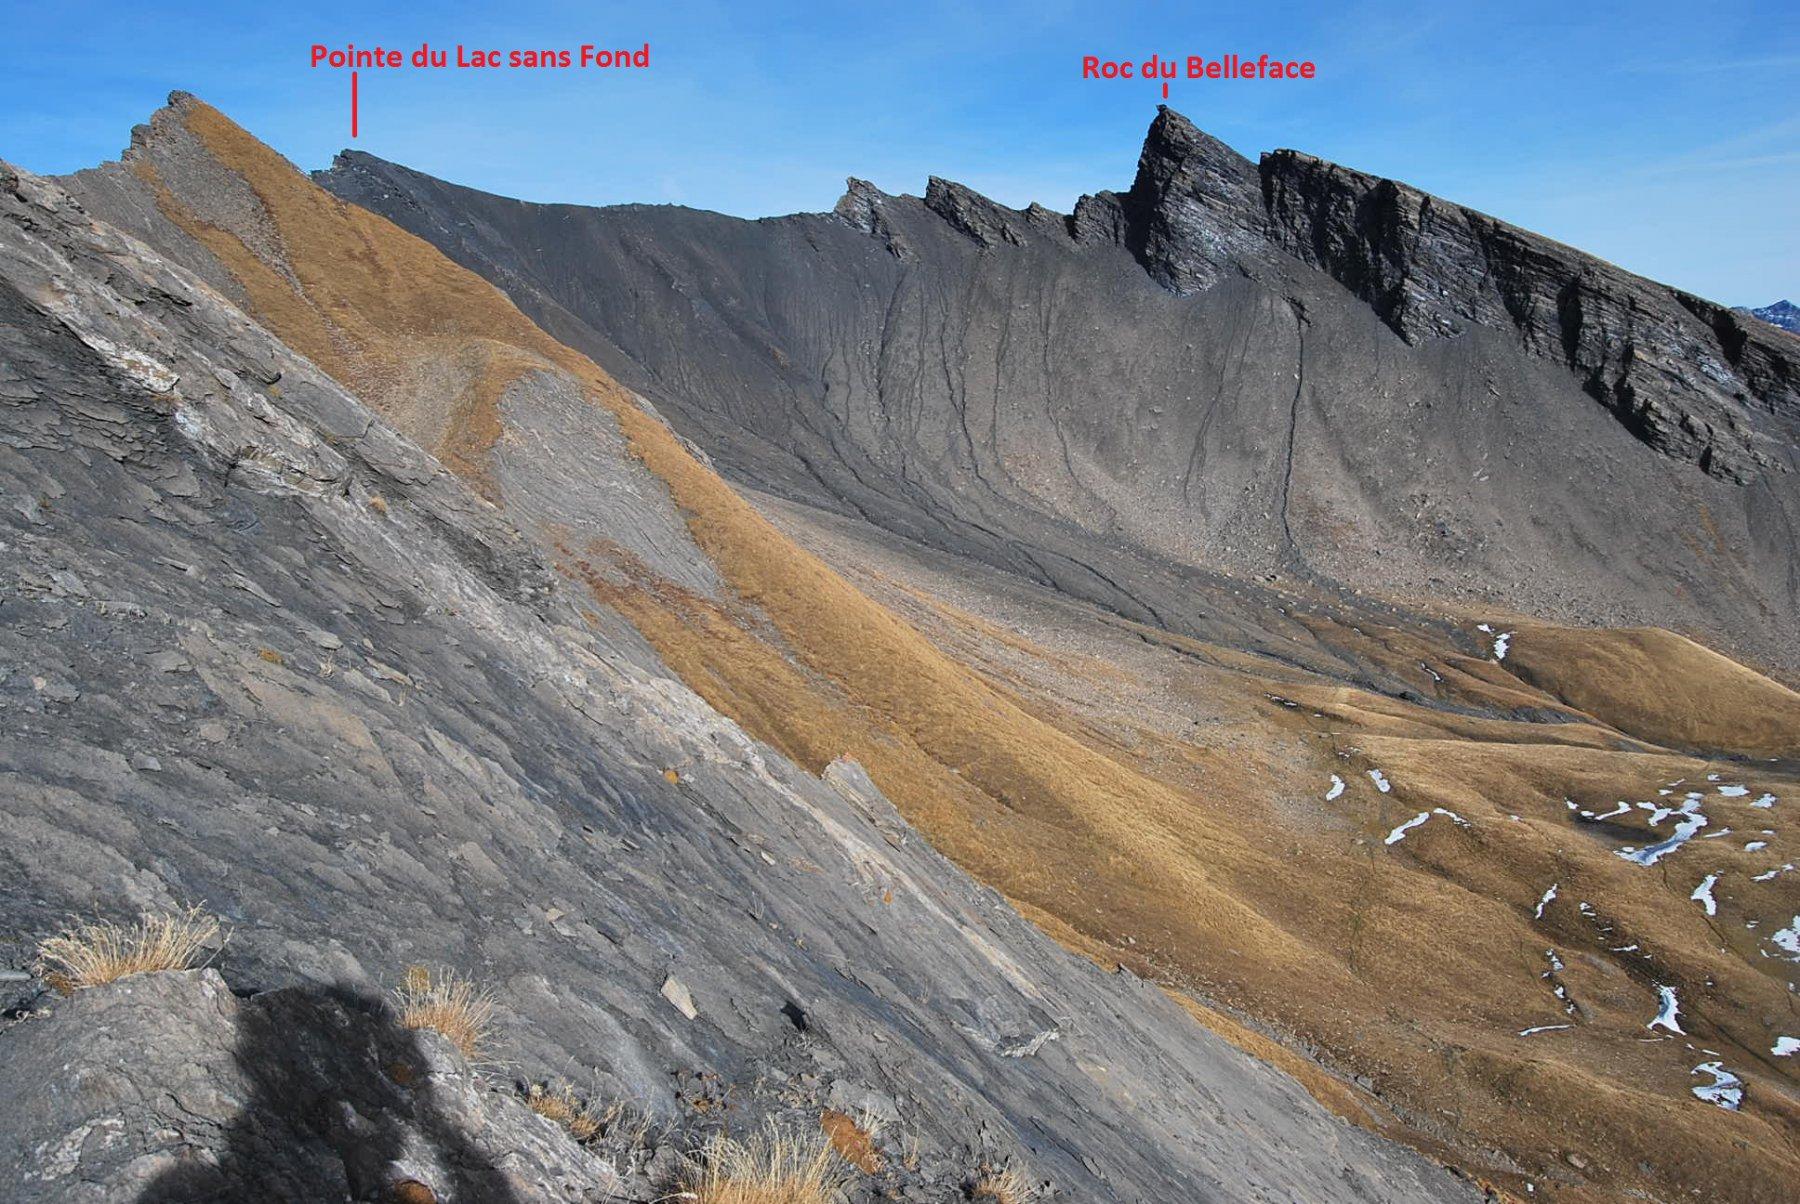 Sans Fond (Lac,Pointe du) dal Colle del Piccolo San Bernardo 2015-11-14